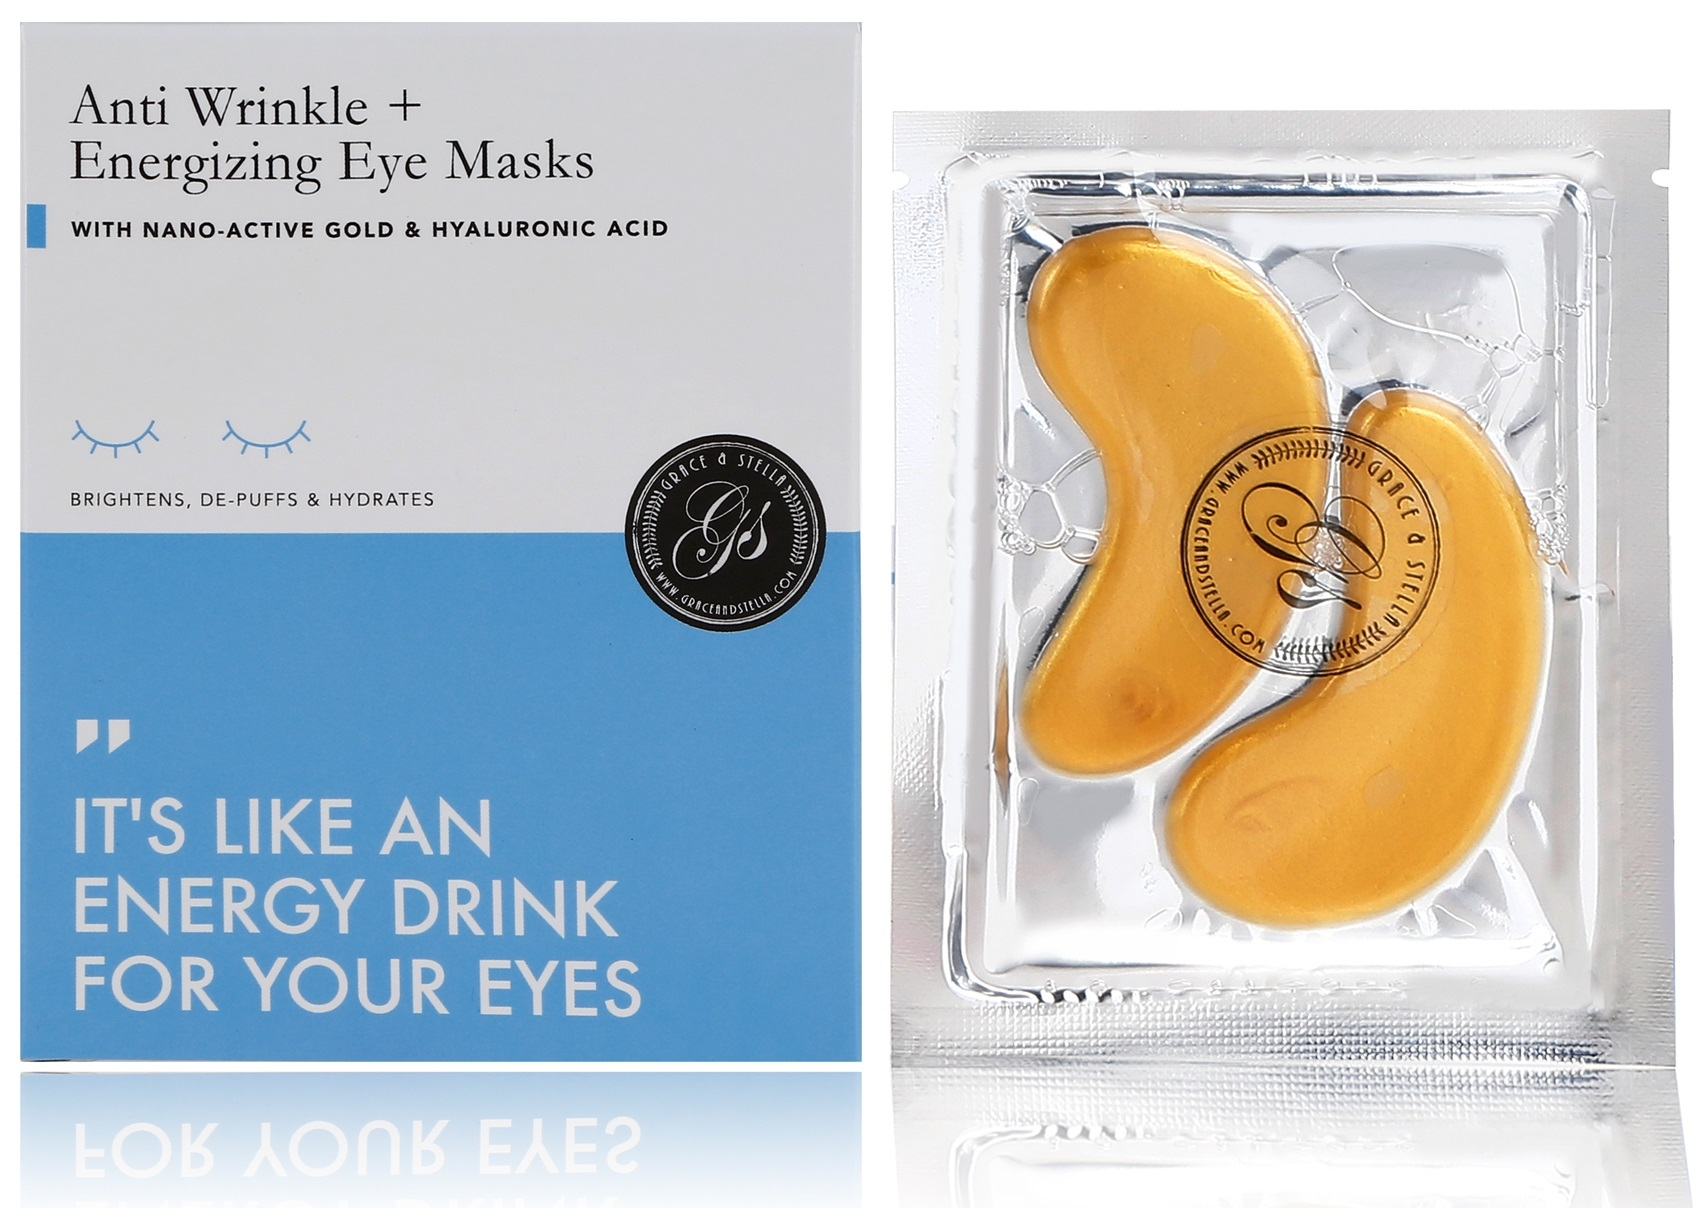 Grace and Stella CO Энергетические Патчи для Области Вокруг Глаз с Коллоидным Золотом и Коллагеном Anti Wrinkle + Energizing Eye Masks, 8 шт